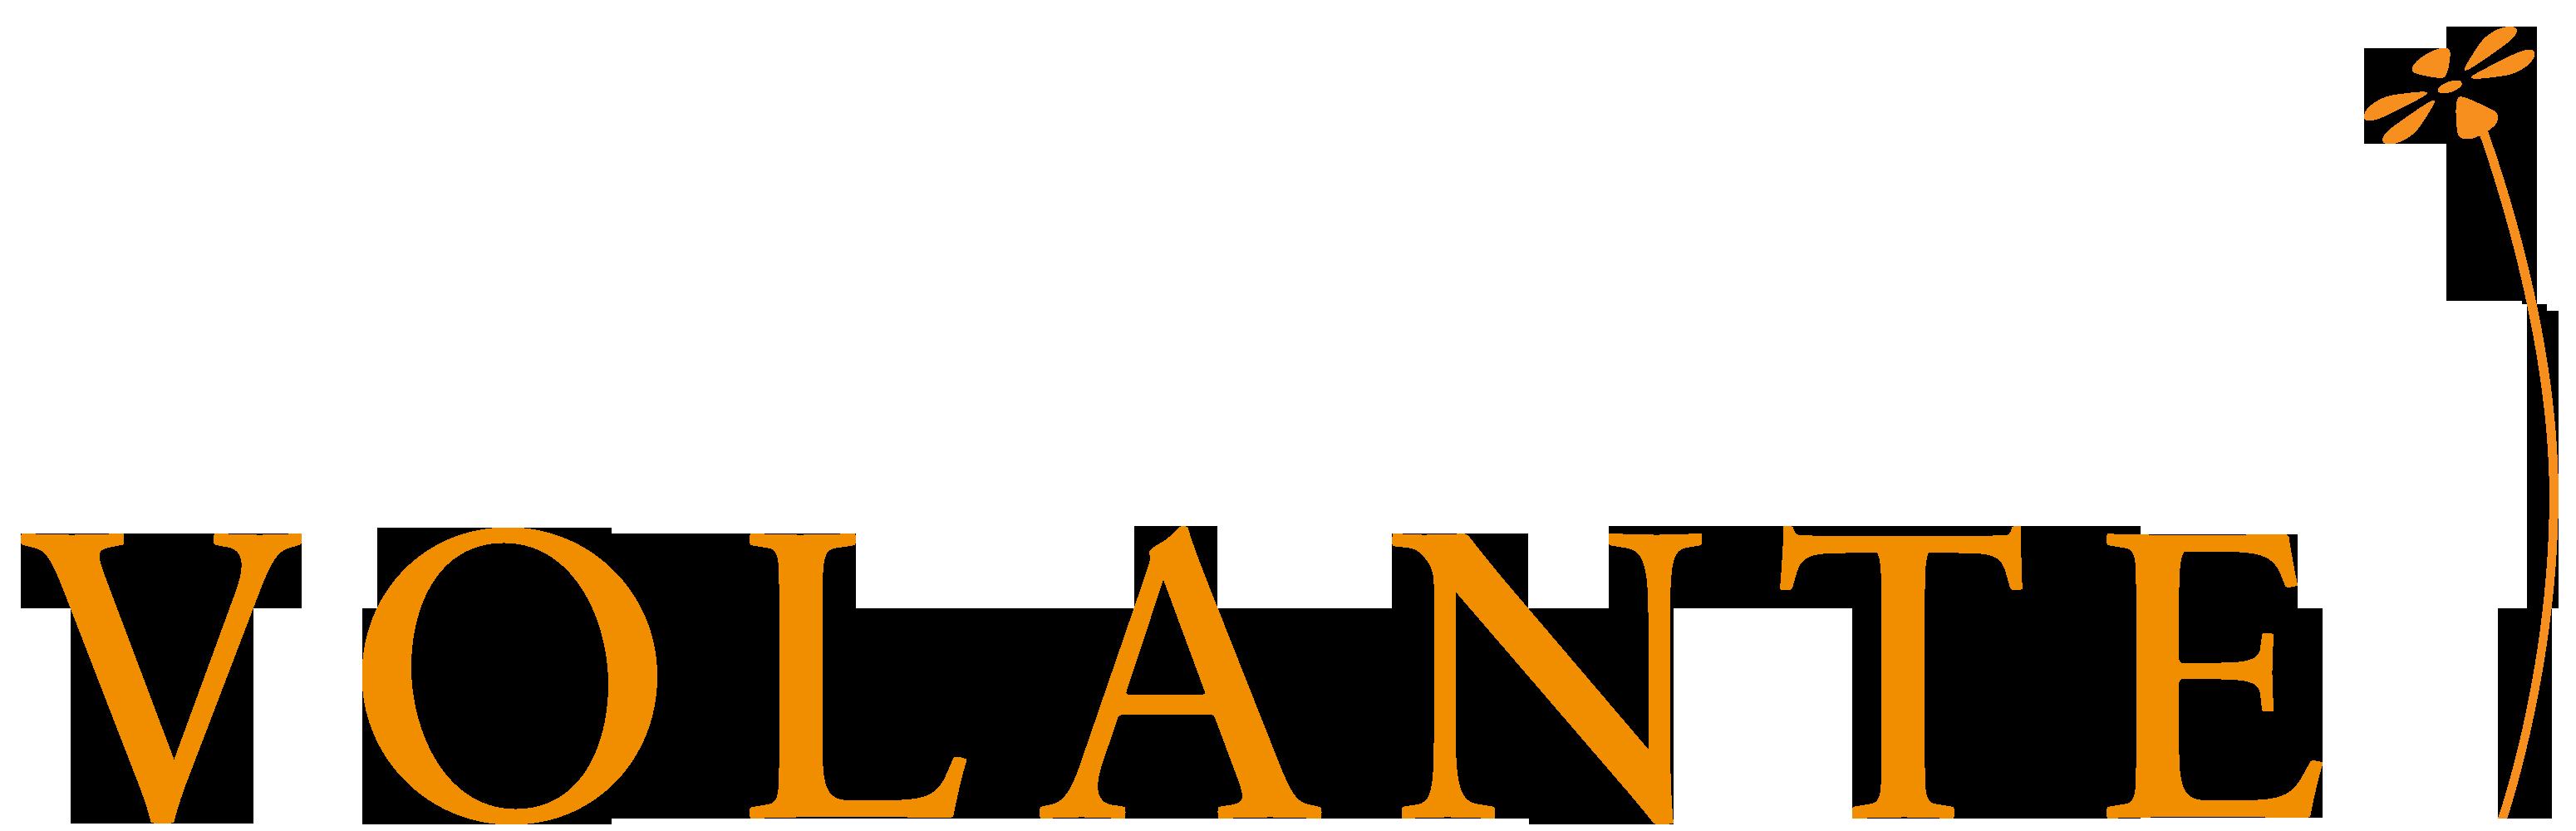 logotyp Volante förlag